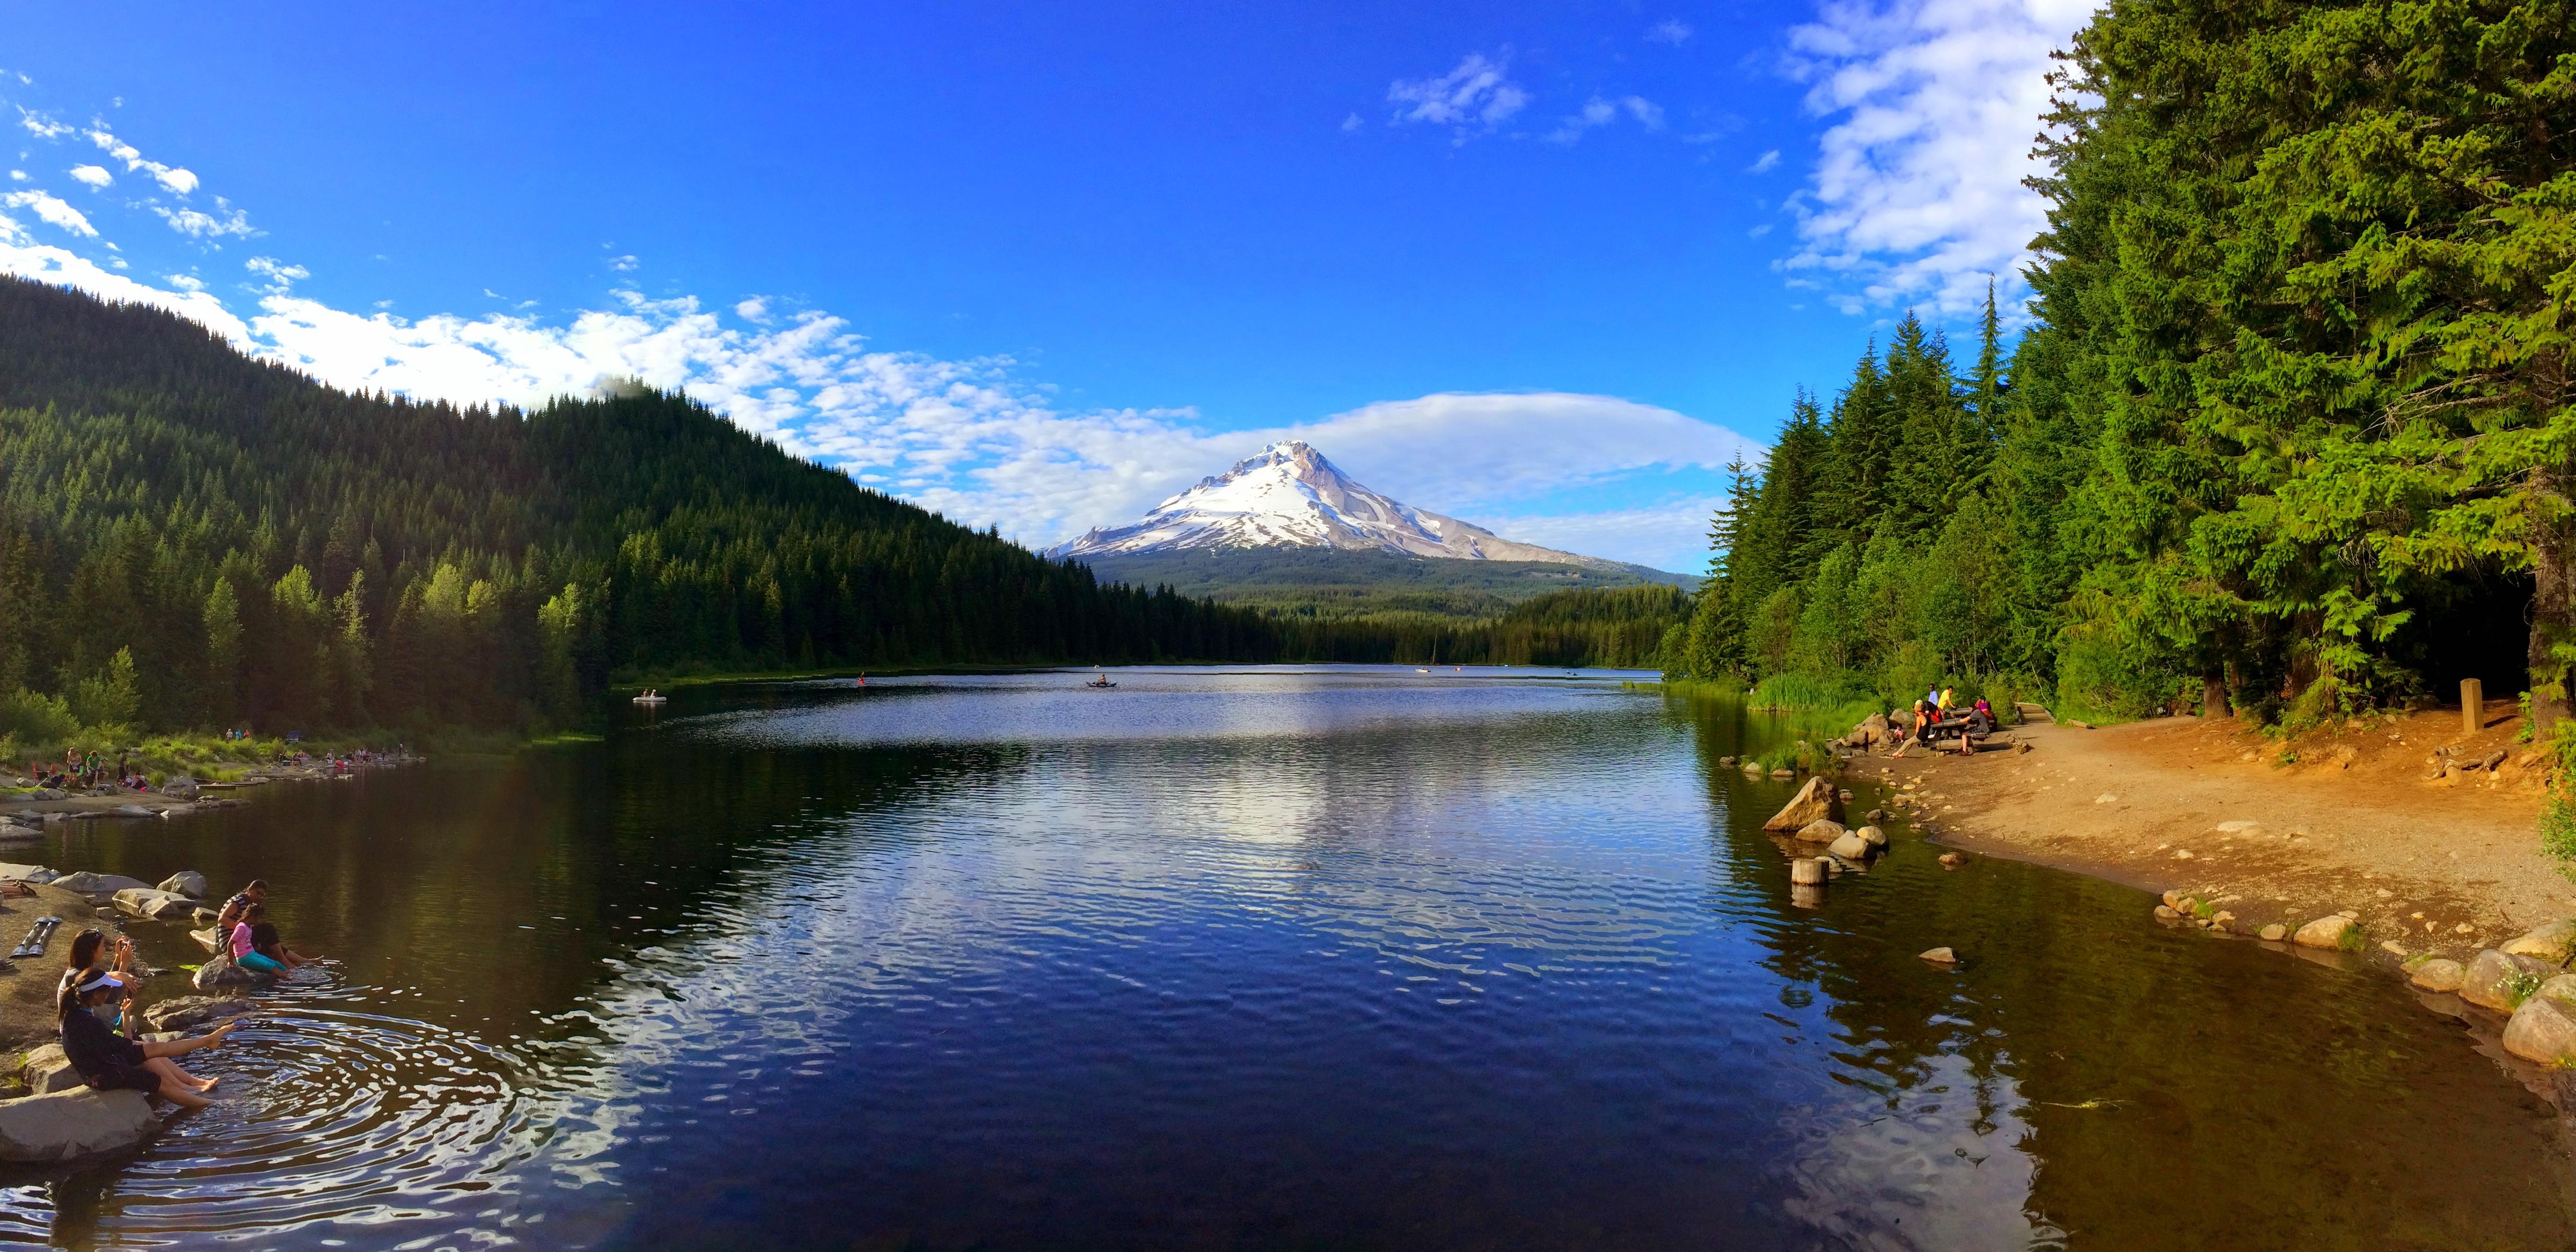 Mt.Hood @ Trillium Lake